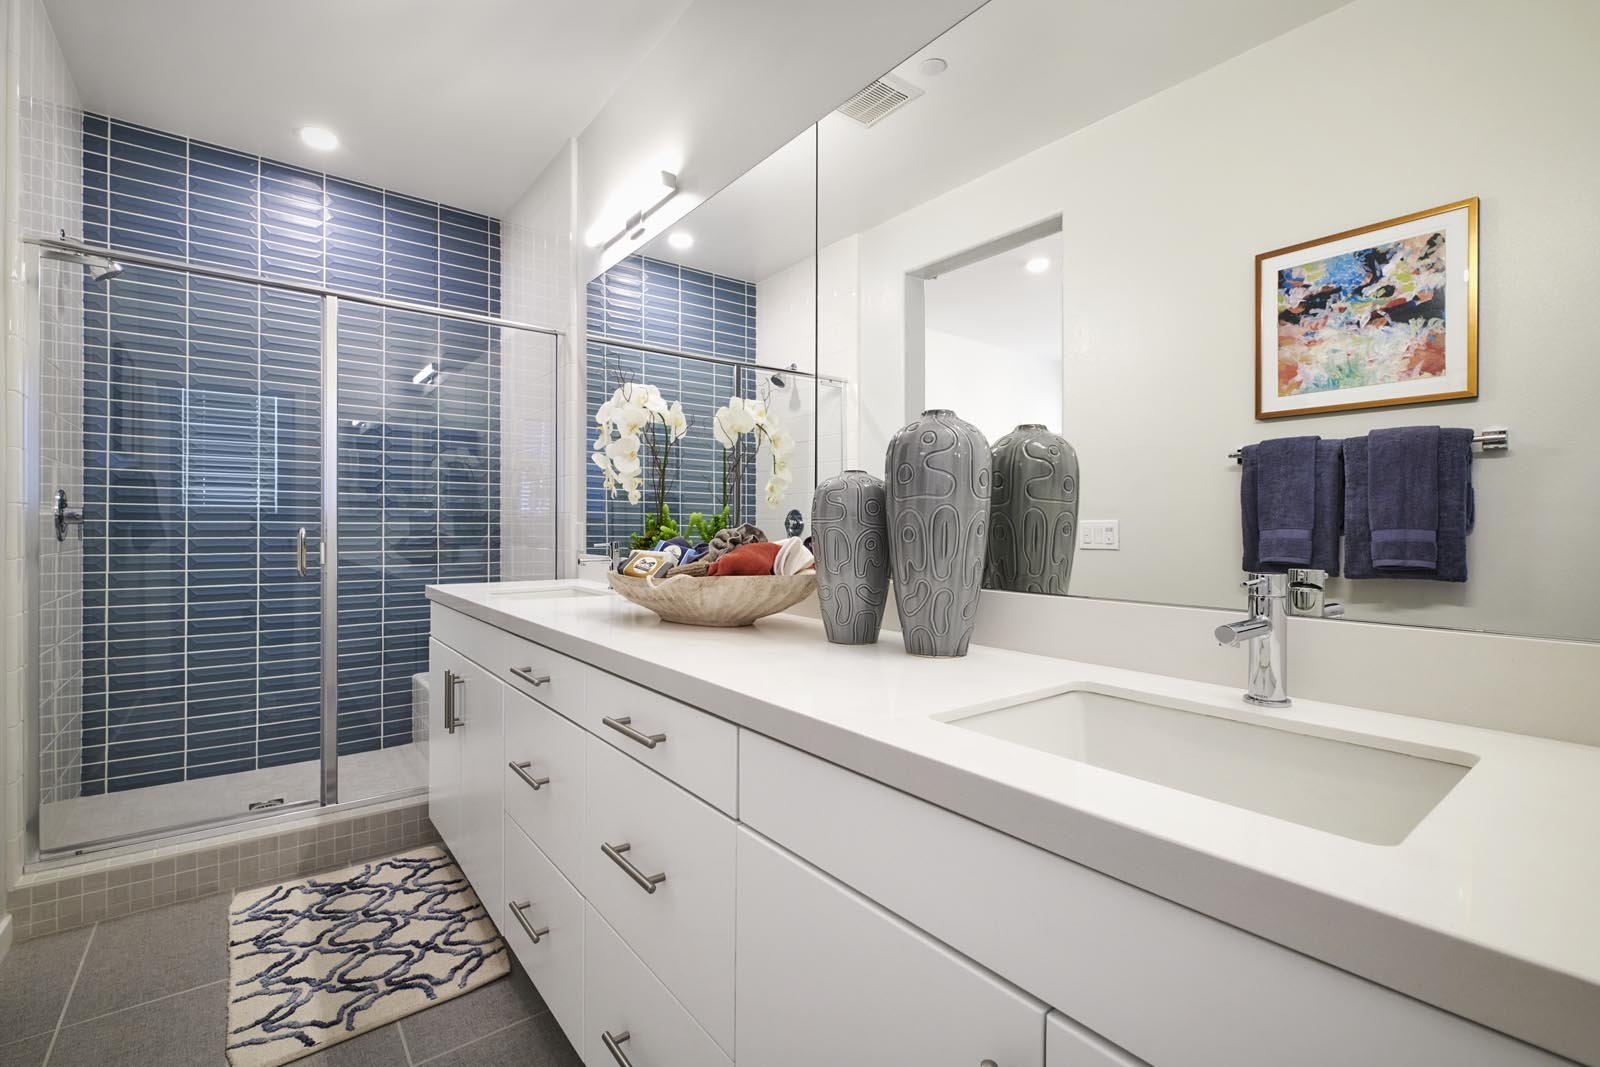 Master Bathroom   Residence 1   Enliven   New Homes in Rancho Cucamonga, CA   Van Daele Homes